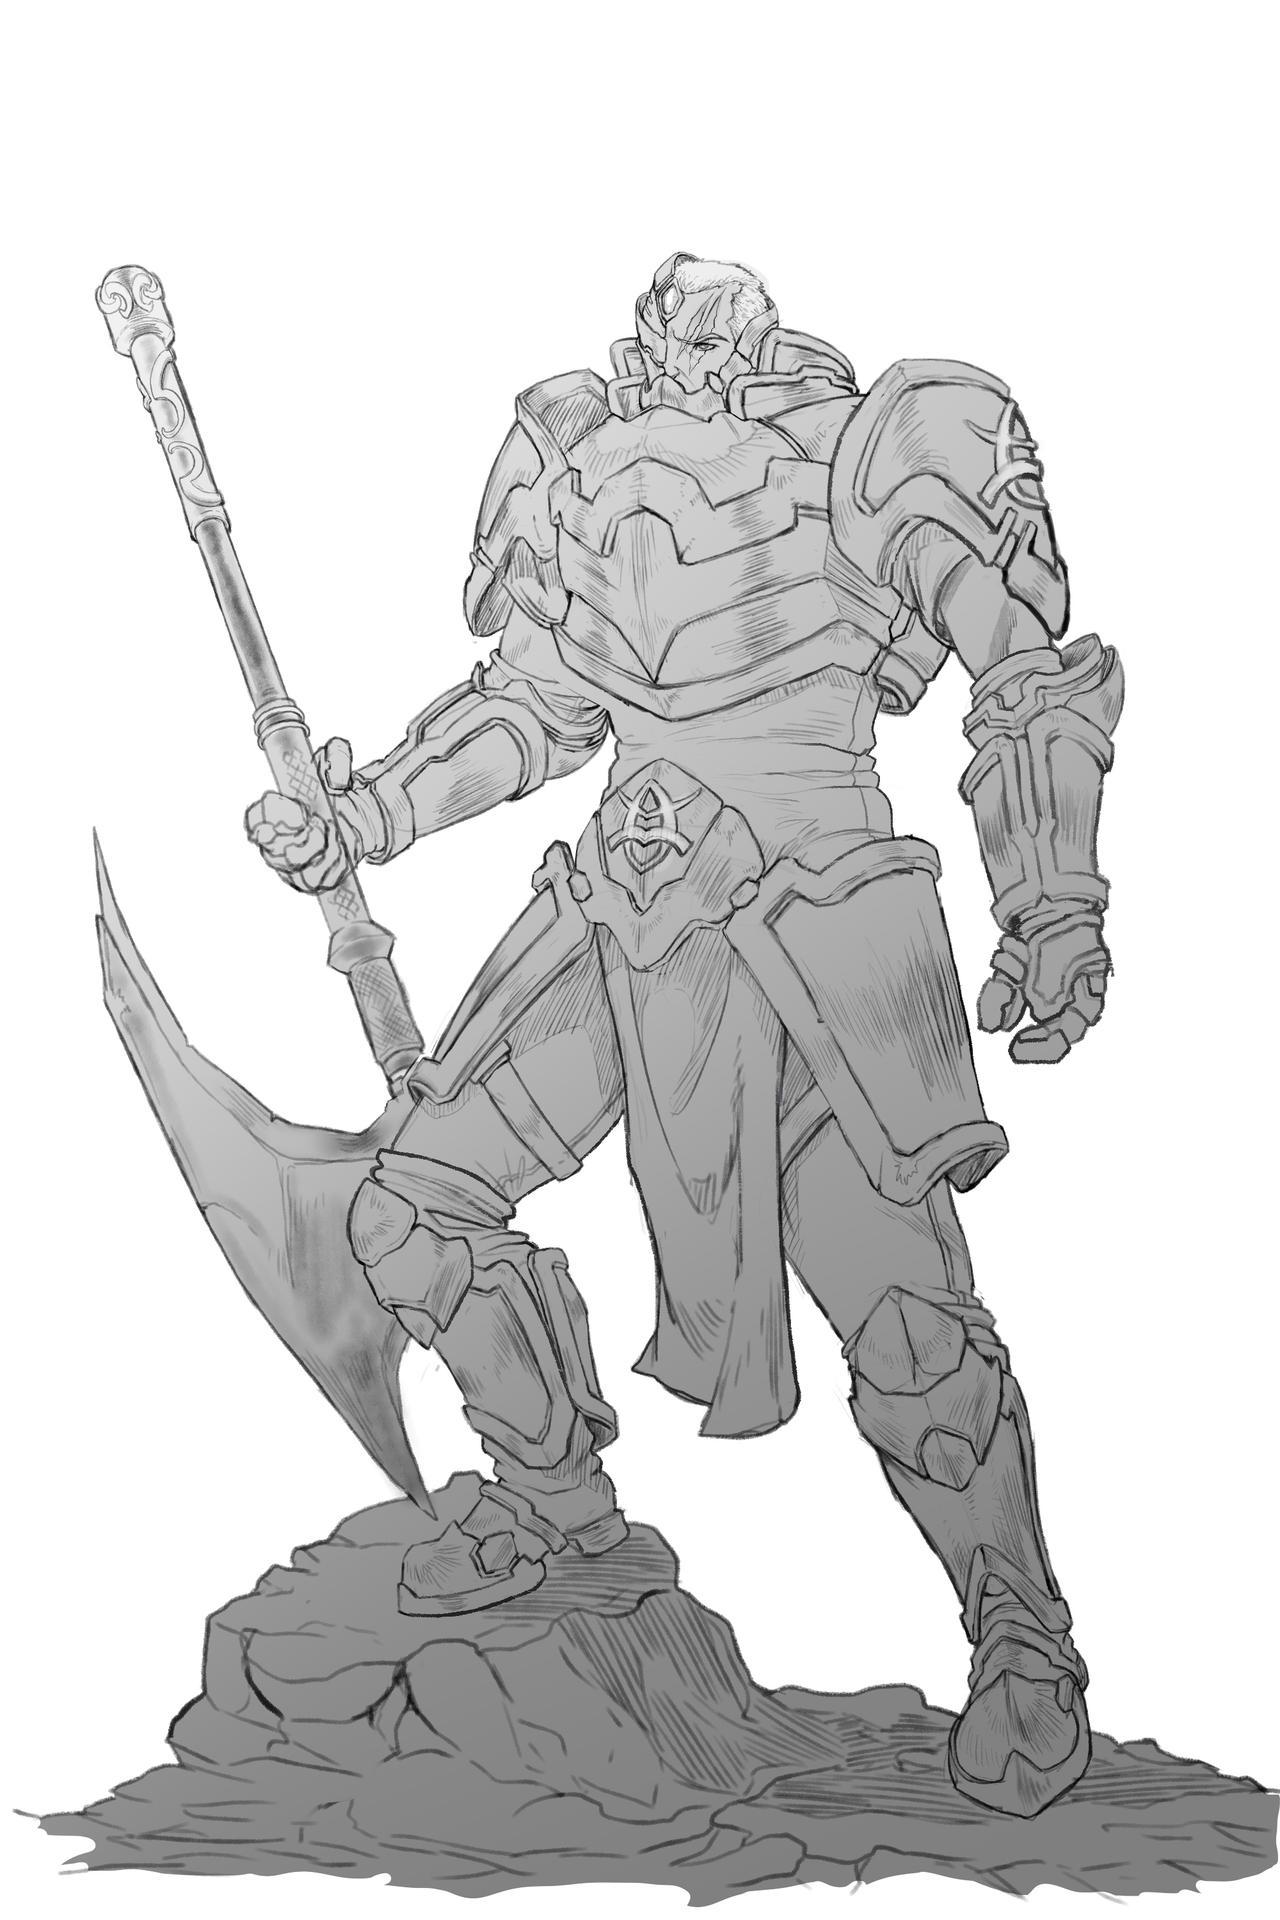 Random-Warrior